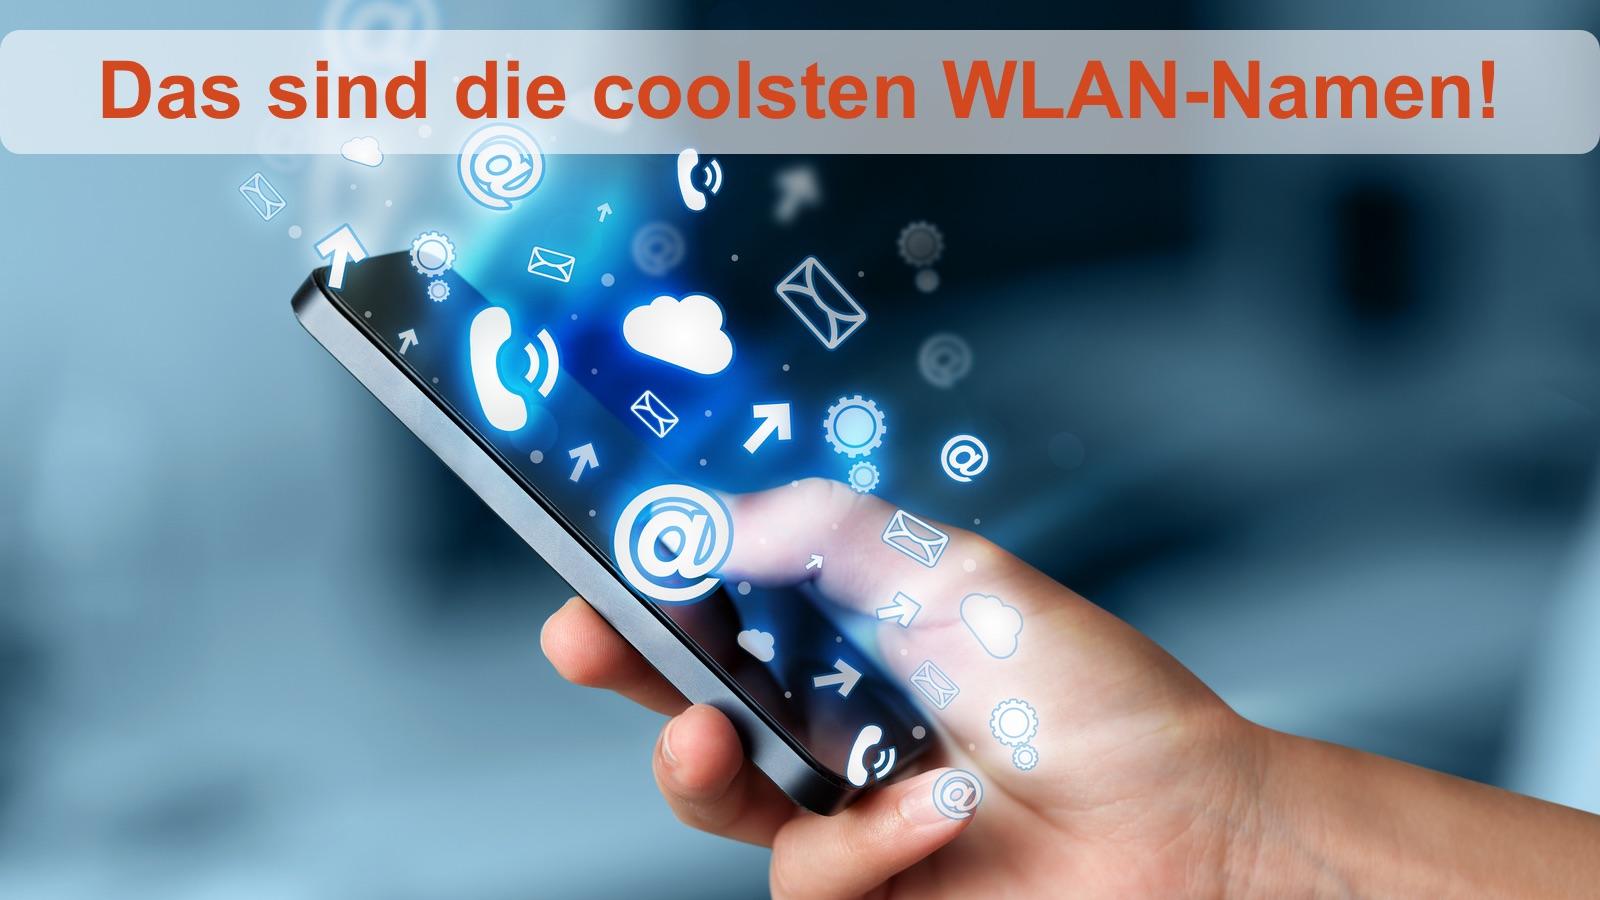 Lustige WLAN-Namen für euer Netzwerk | © ra2 studio – Fotolia.com